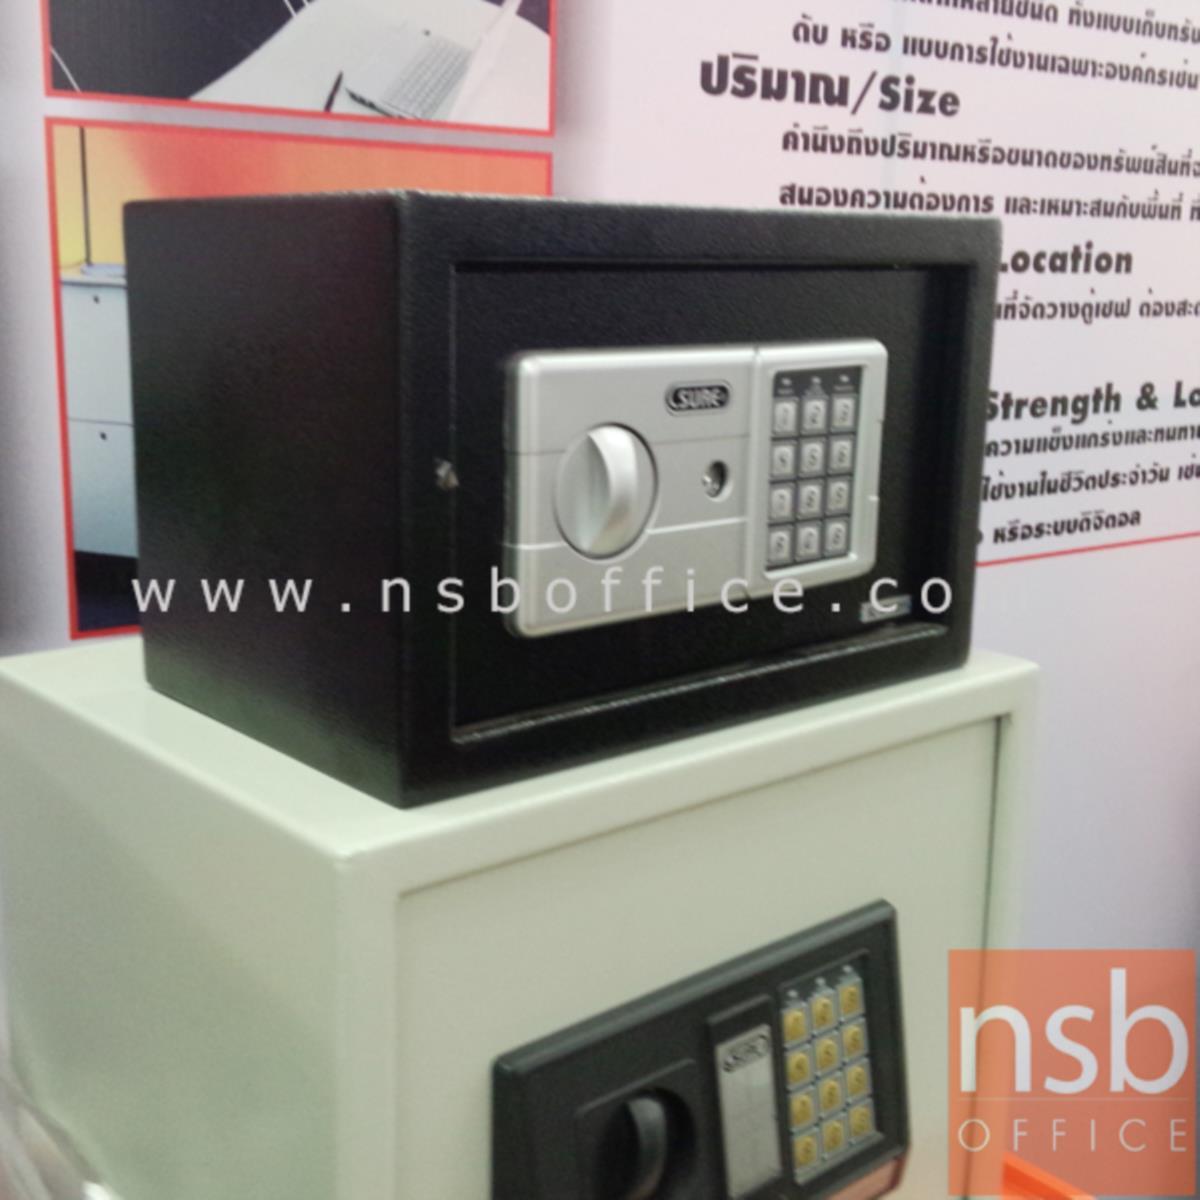 F03A011:ตู้เซฟดิจิตอล SR-ES-1A (1 รหัสกด / ปุ่มหมุนบิด) ขนาด 31W*20D*20H cm.